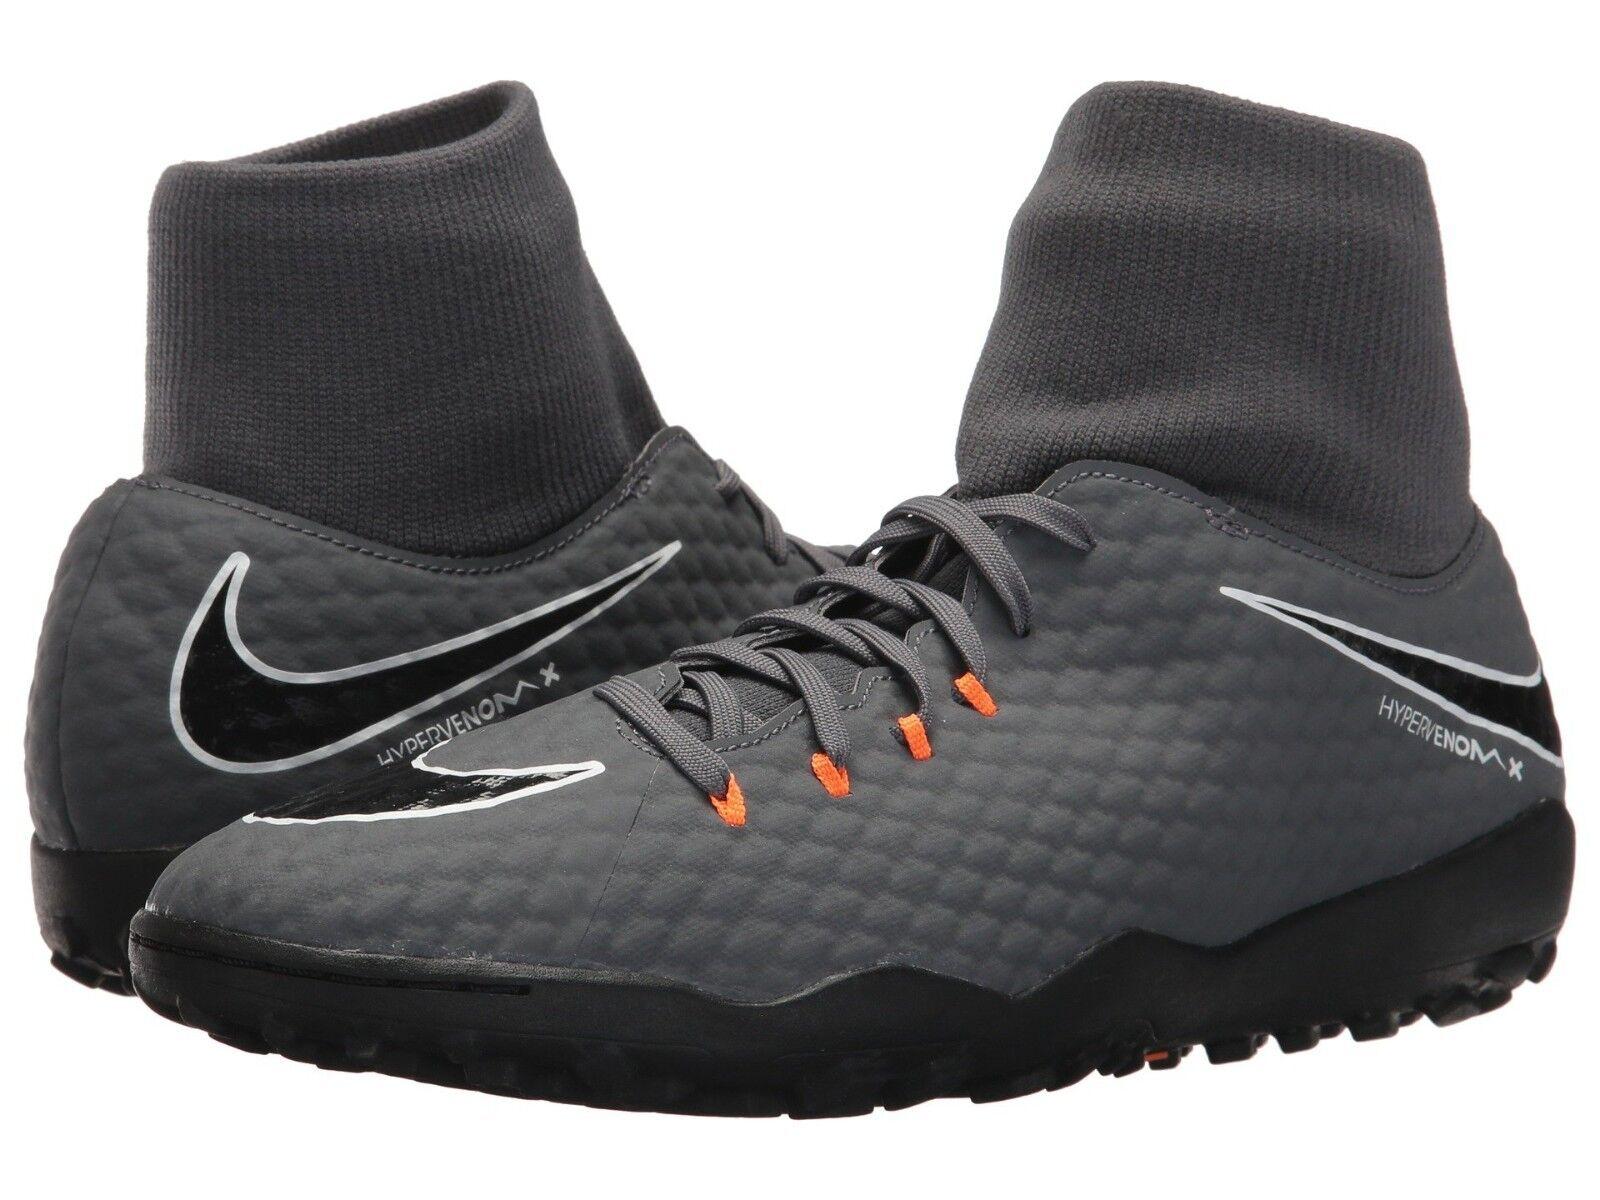 Nike phantomx 3 academy di tf Uomo grigio scuro / totale arancione bianco ah7276-081 scarpe